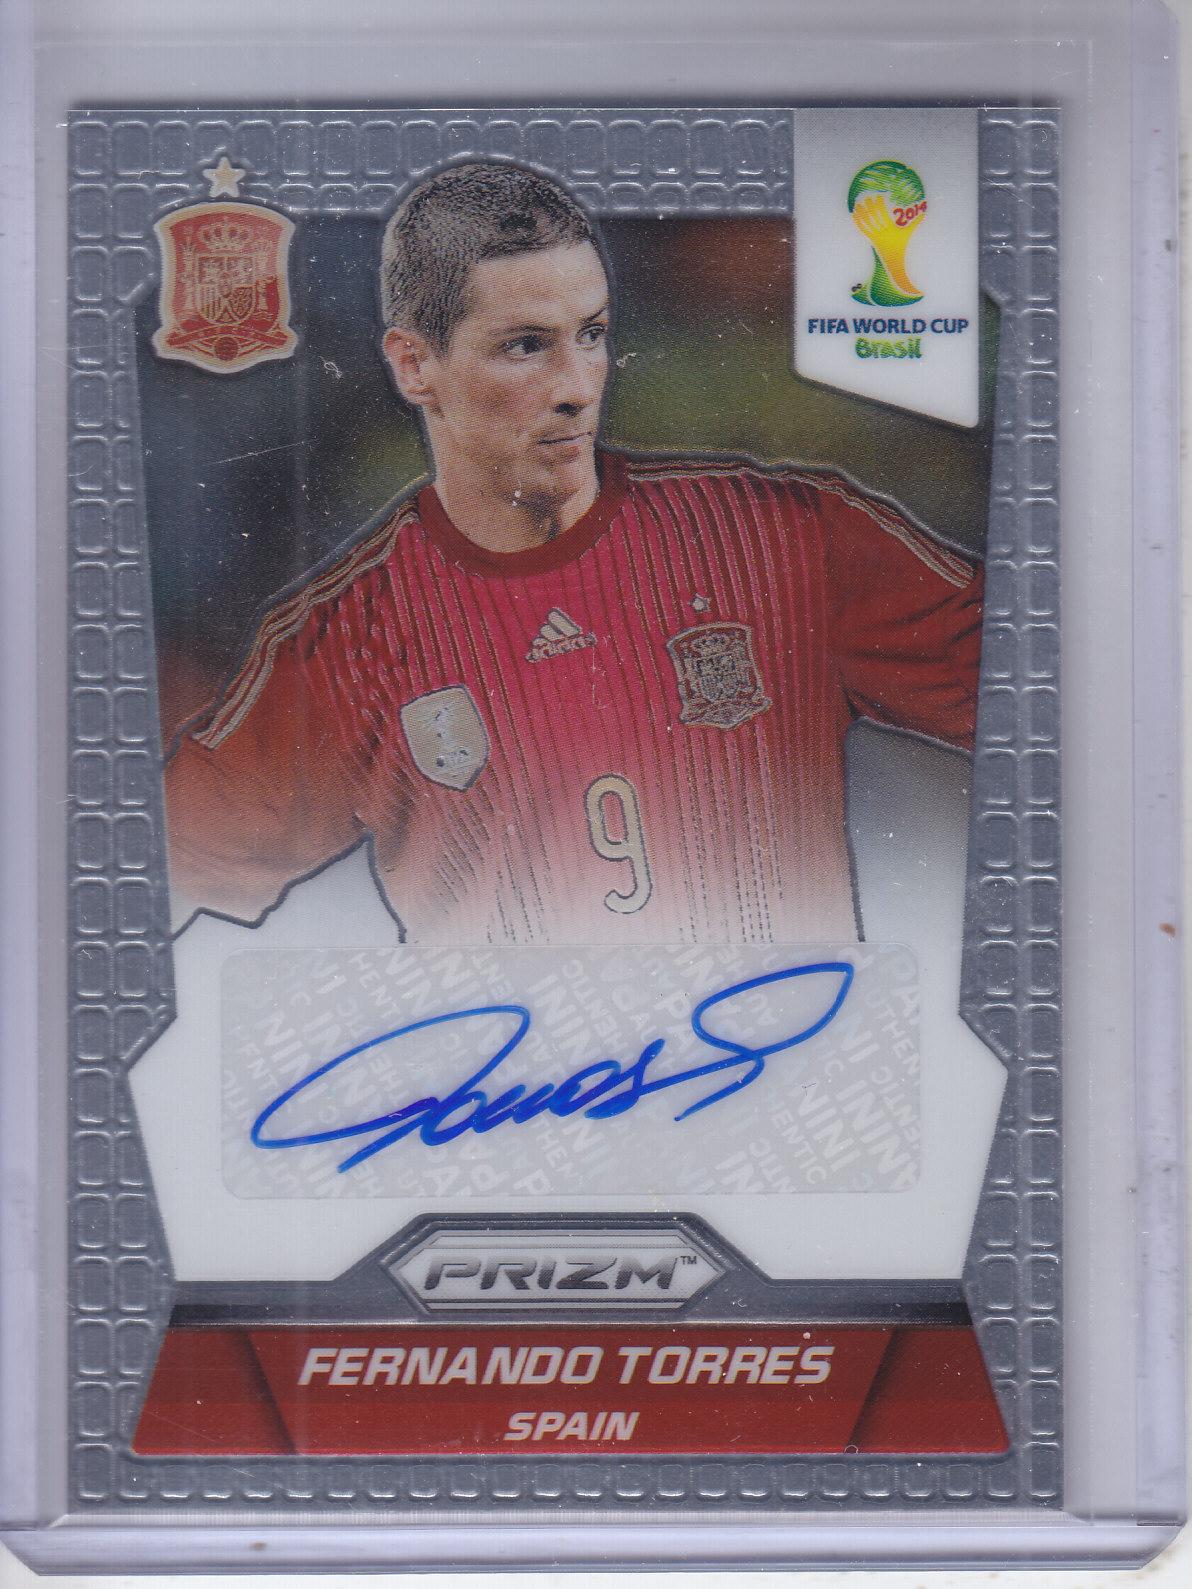 2014 Panini Prizm World Cup Signatures #SFT Fernando Torres